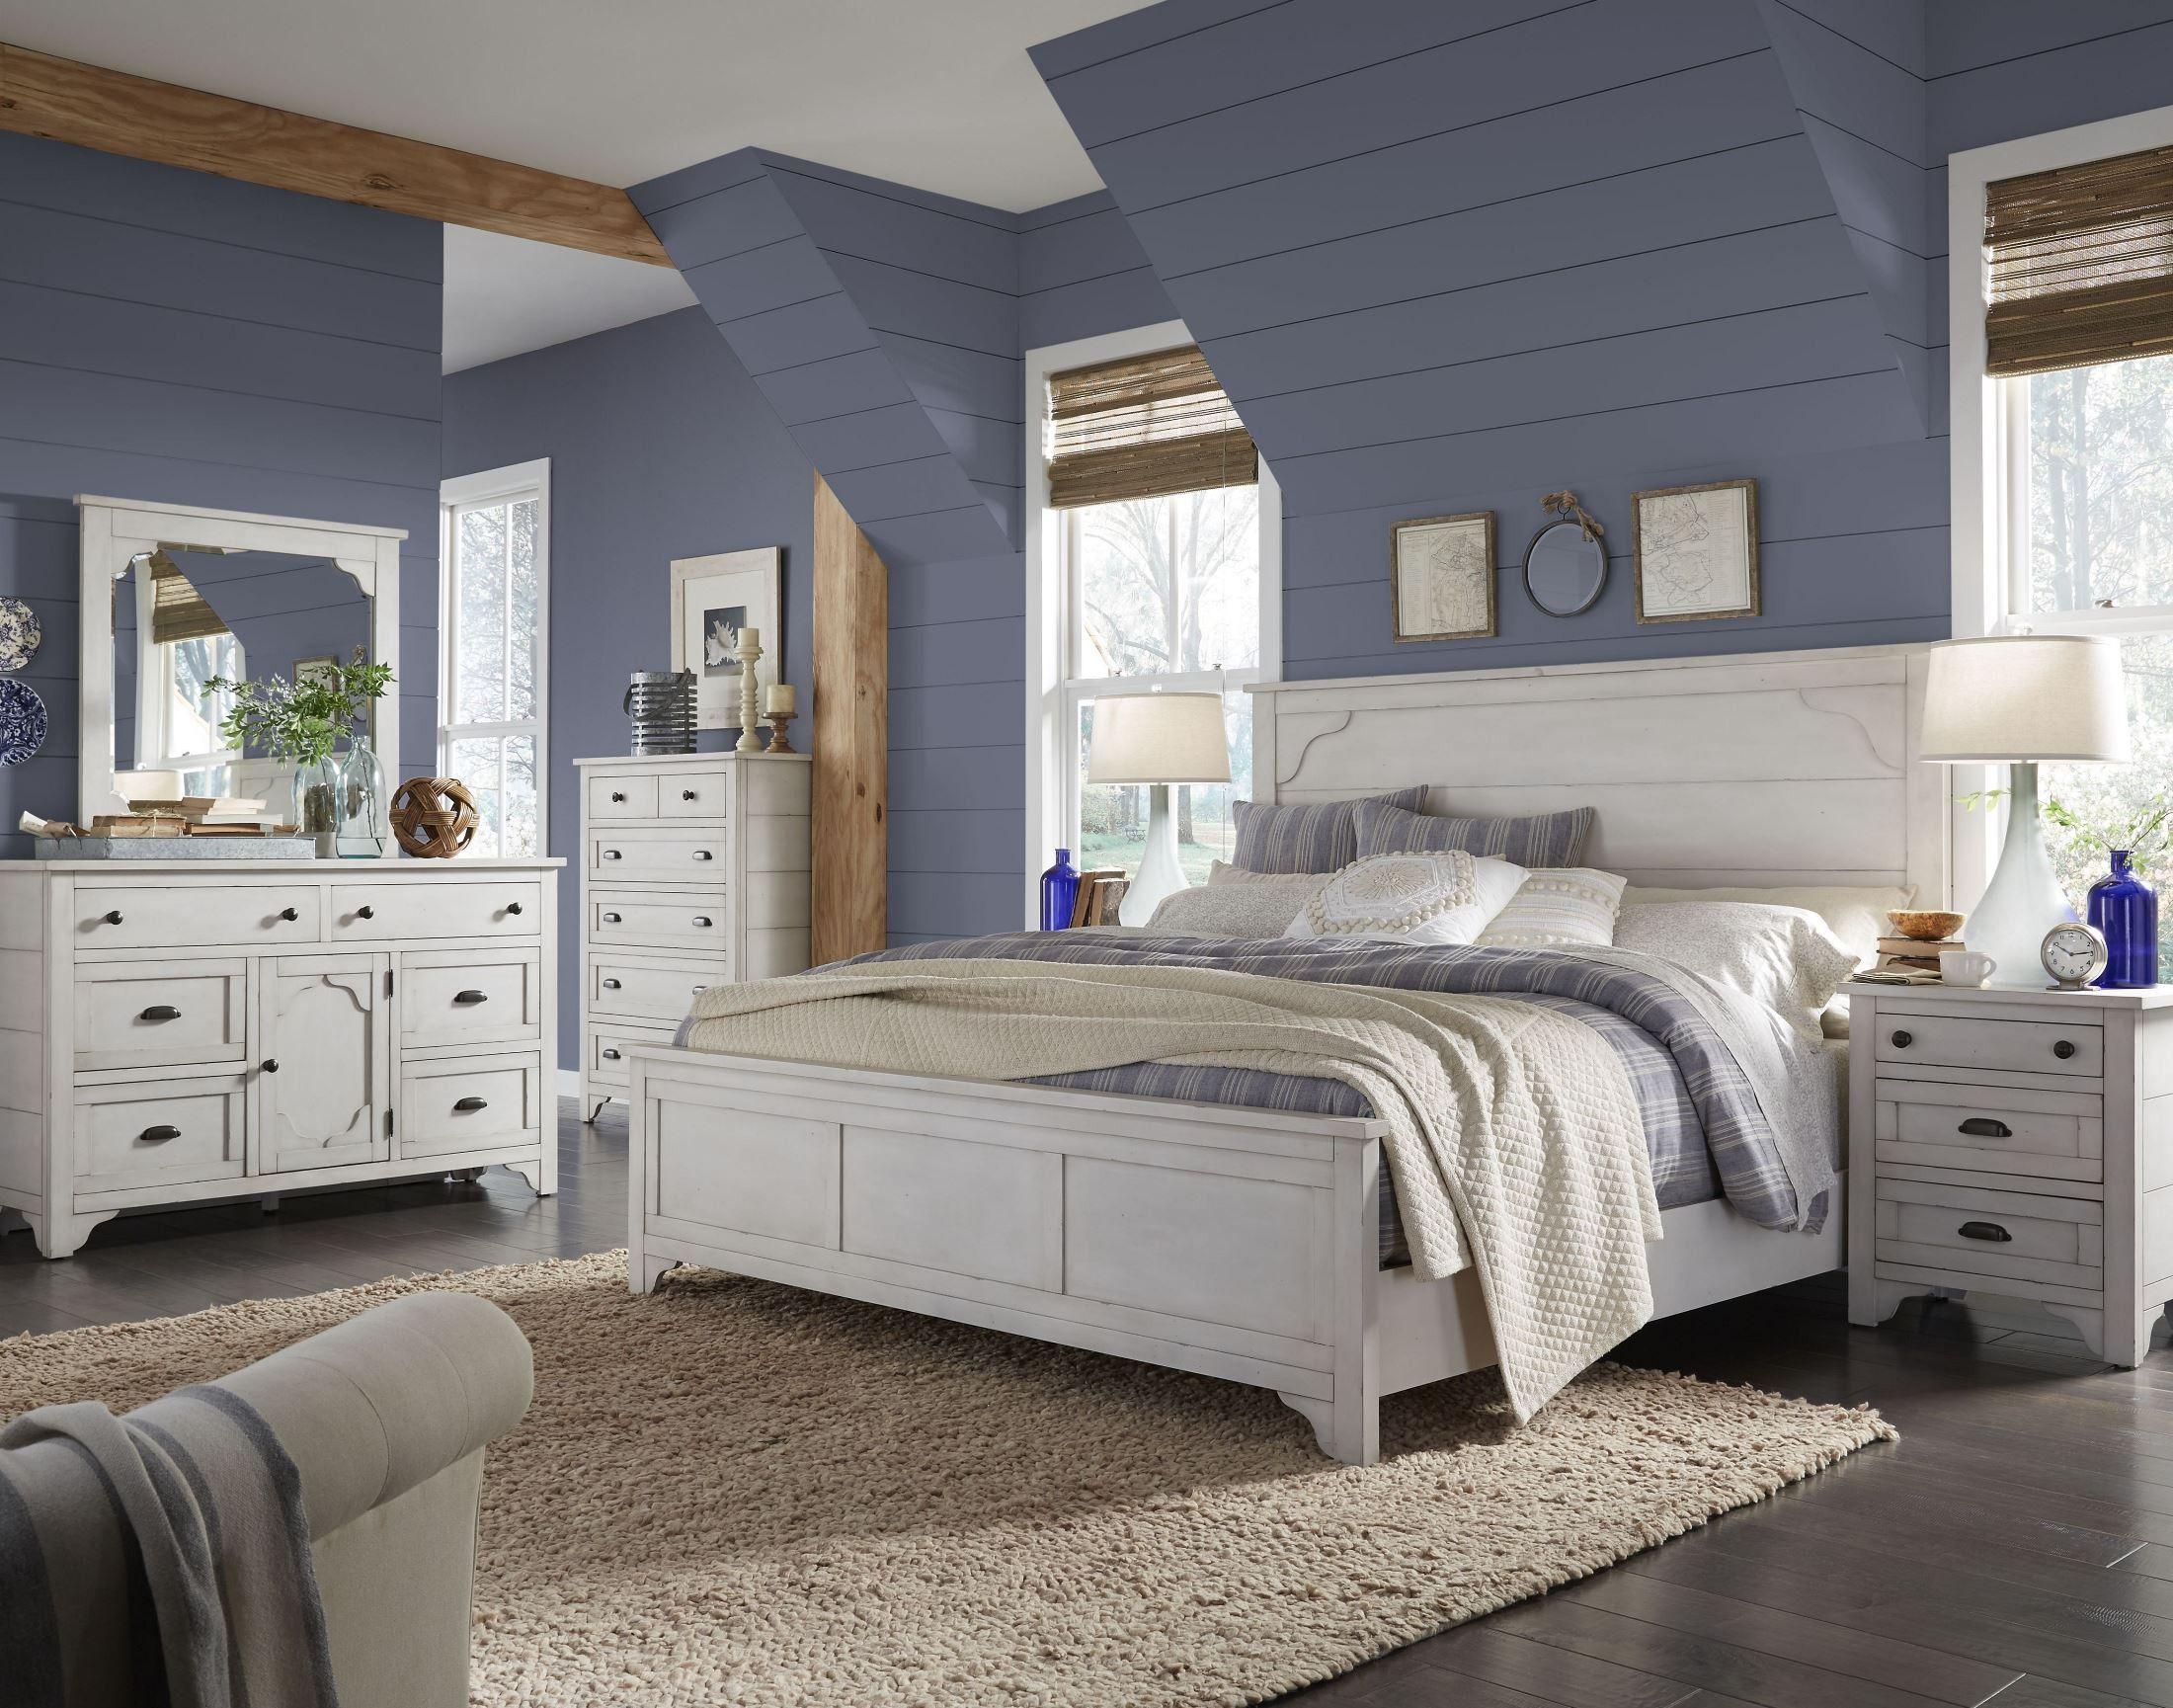 Antikes Schlafzimmer Sets – https://pickndecor.com/dekor